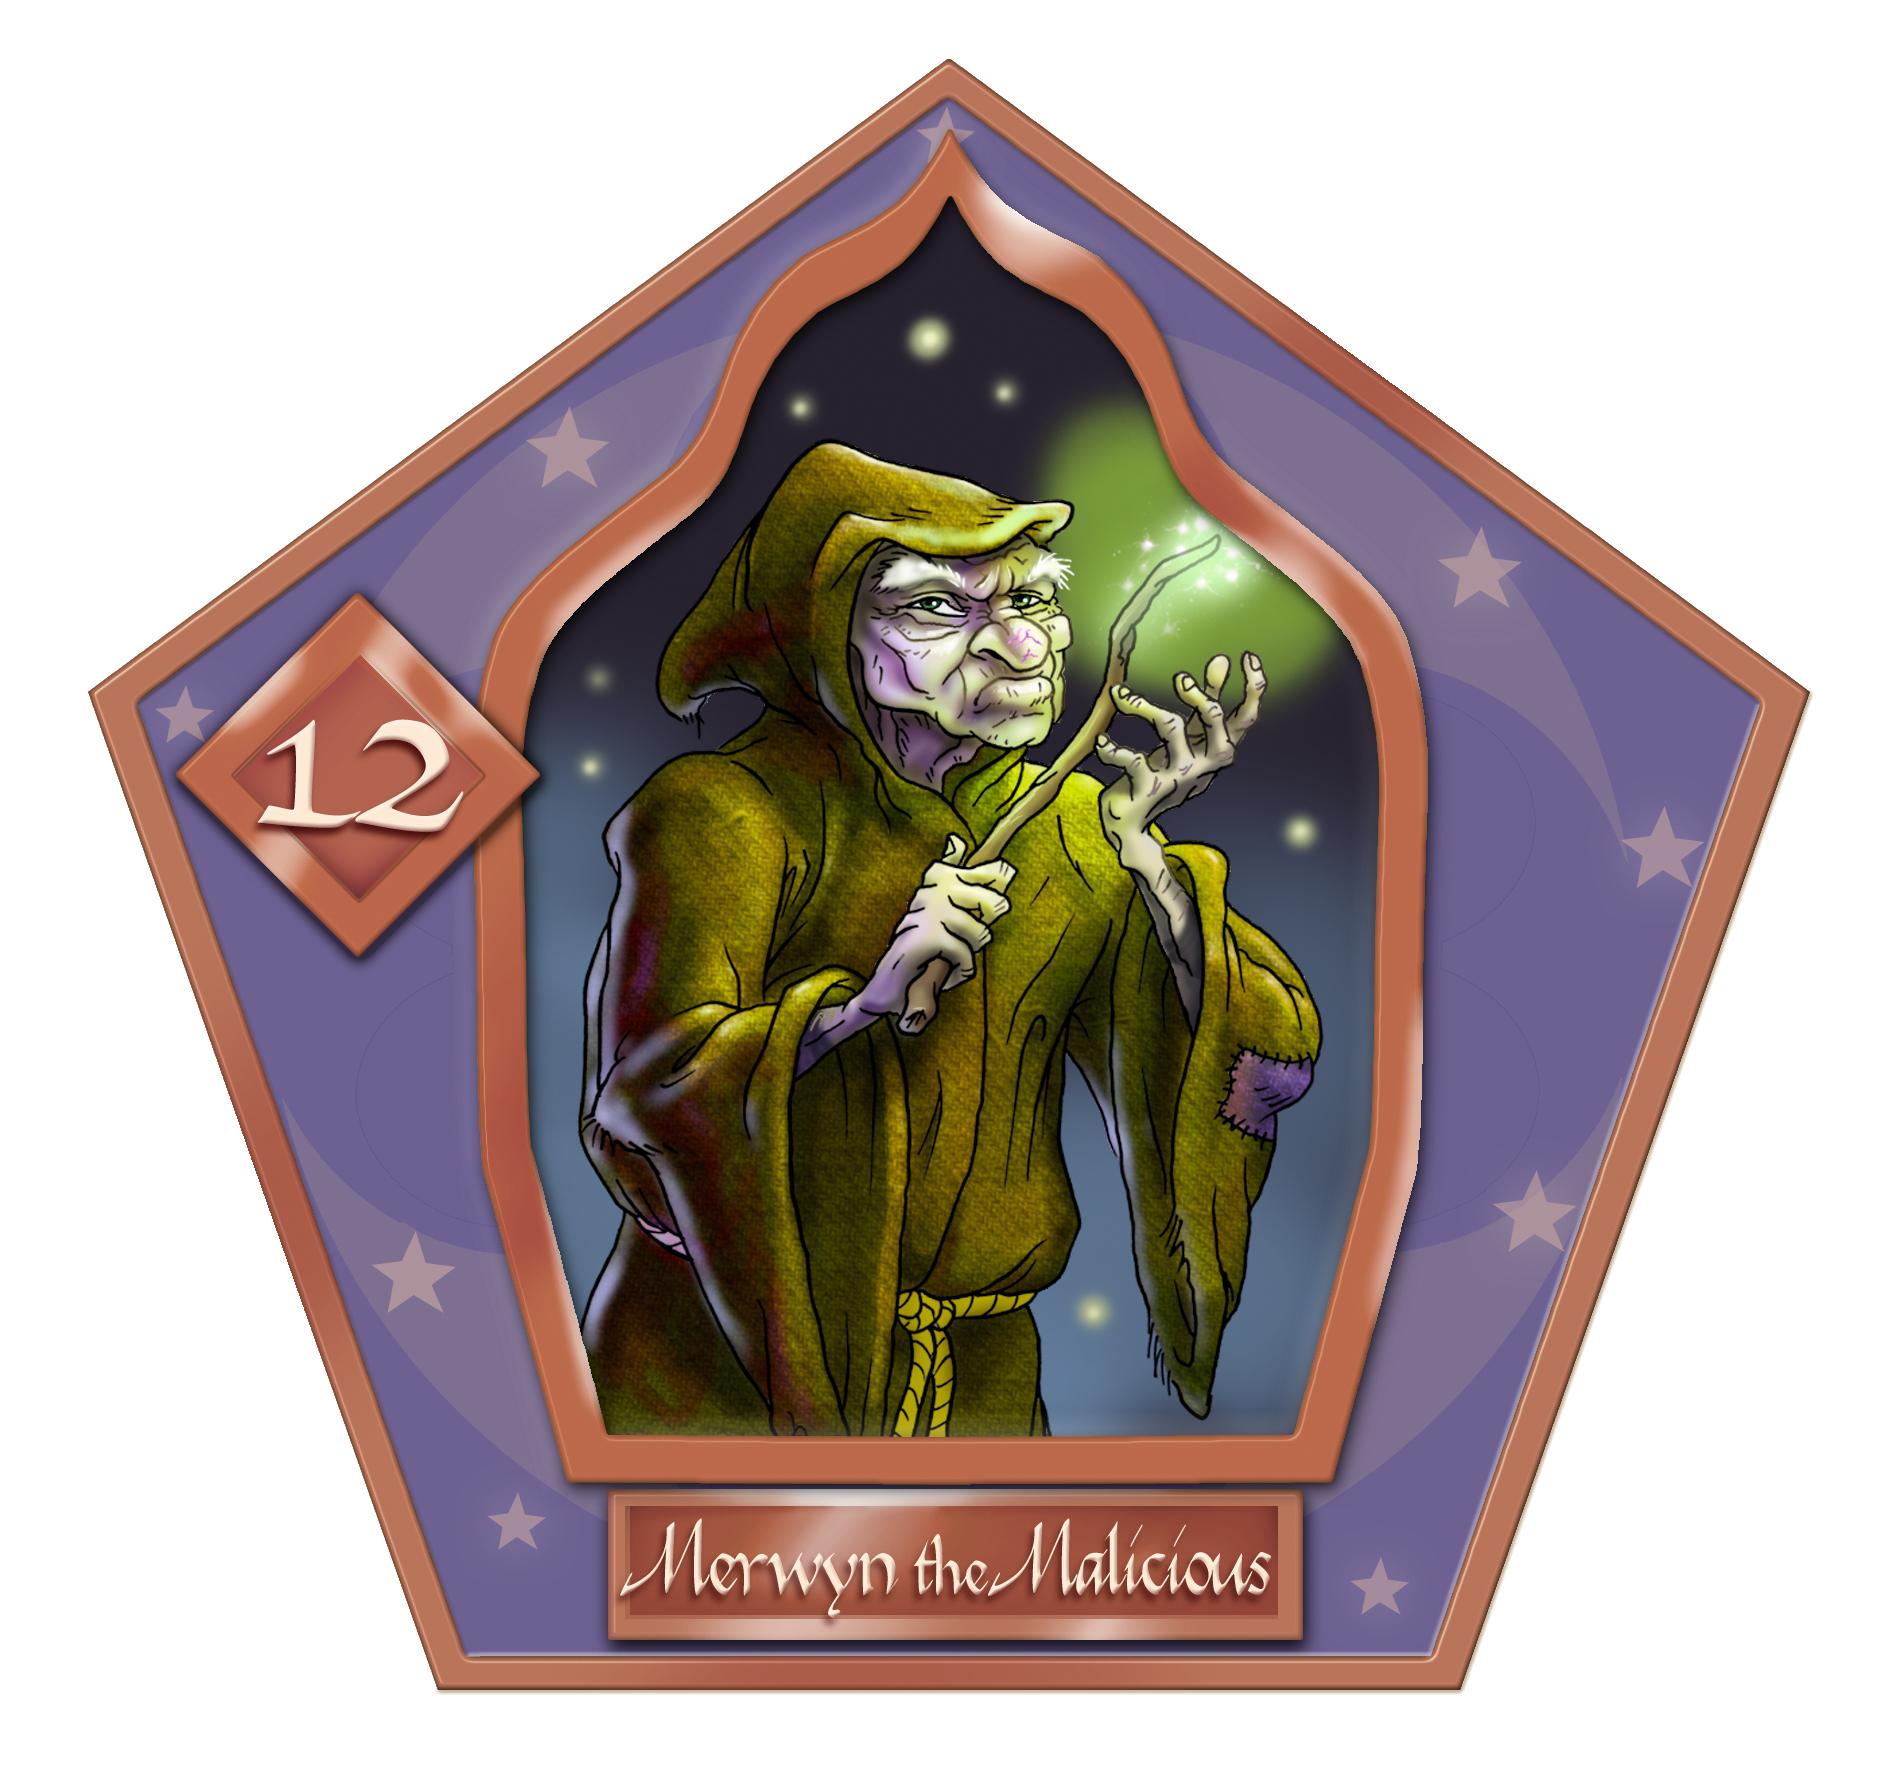 File:Merwyn The Malicious-12-chocFrogCard.png